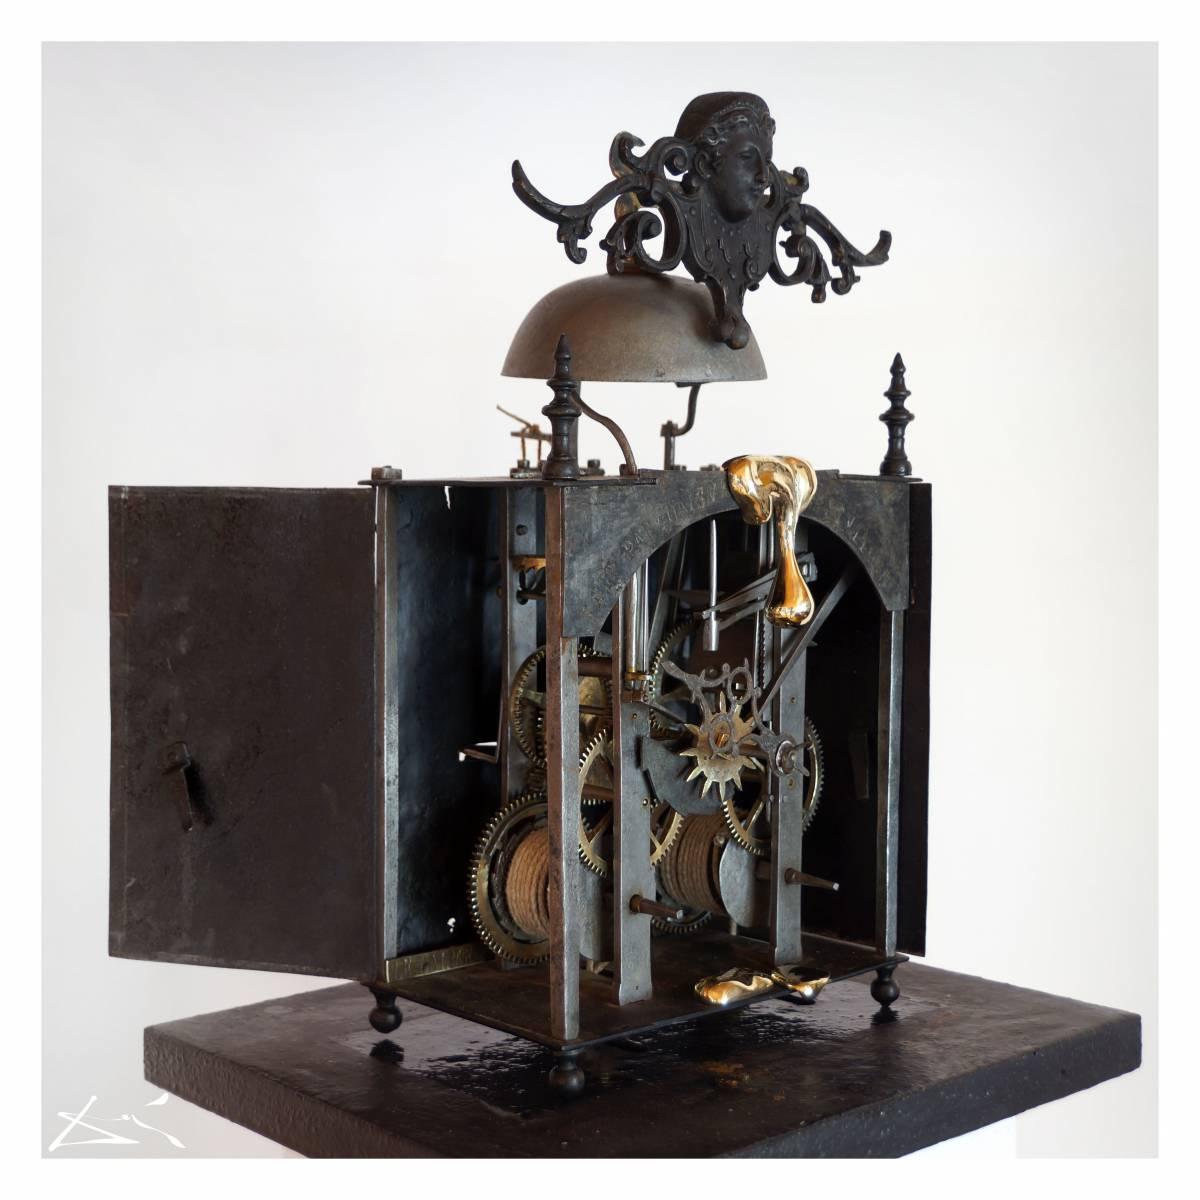 'THE CALM BEFORE THE STORM, Paris 1724' von  MUSICA Daisuke Schneider